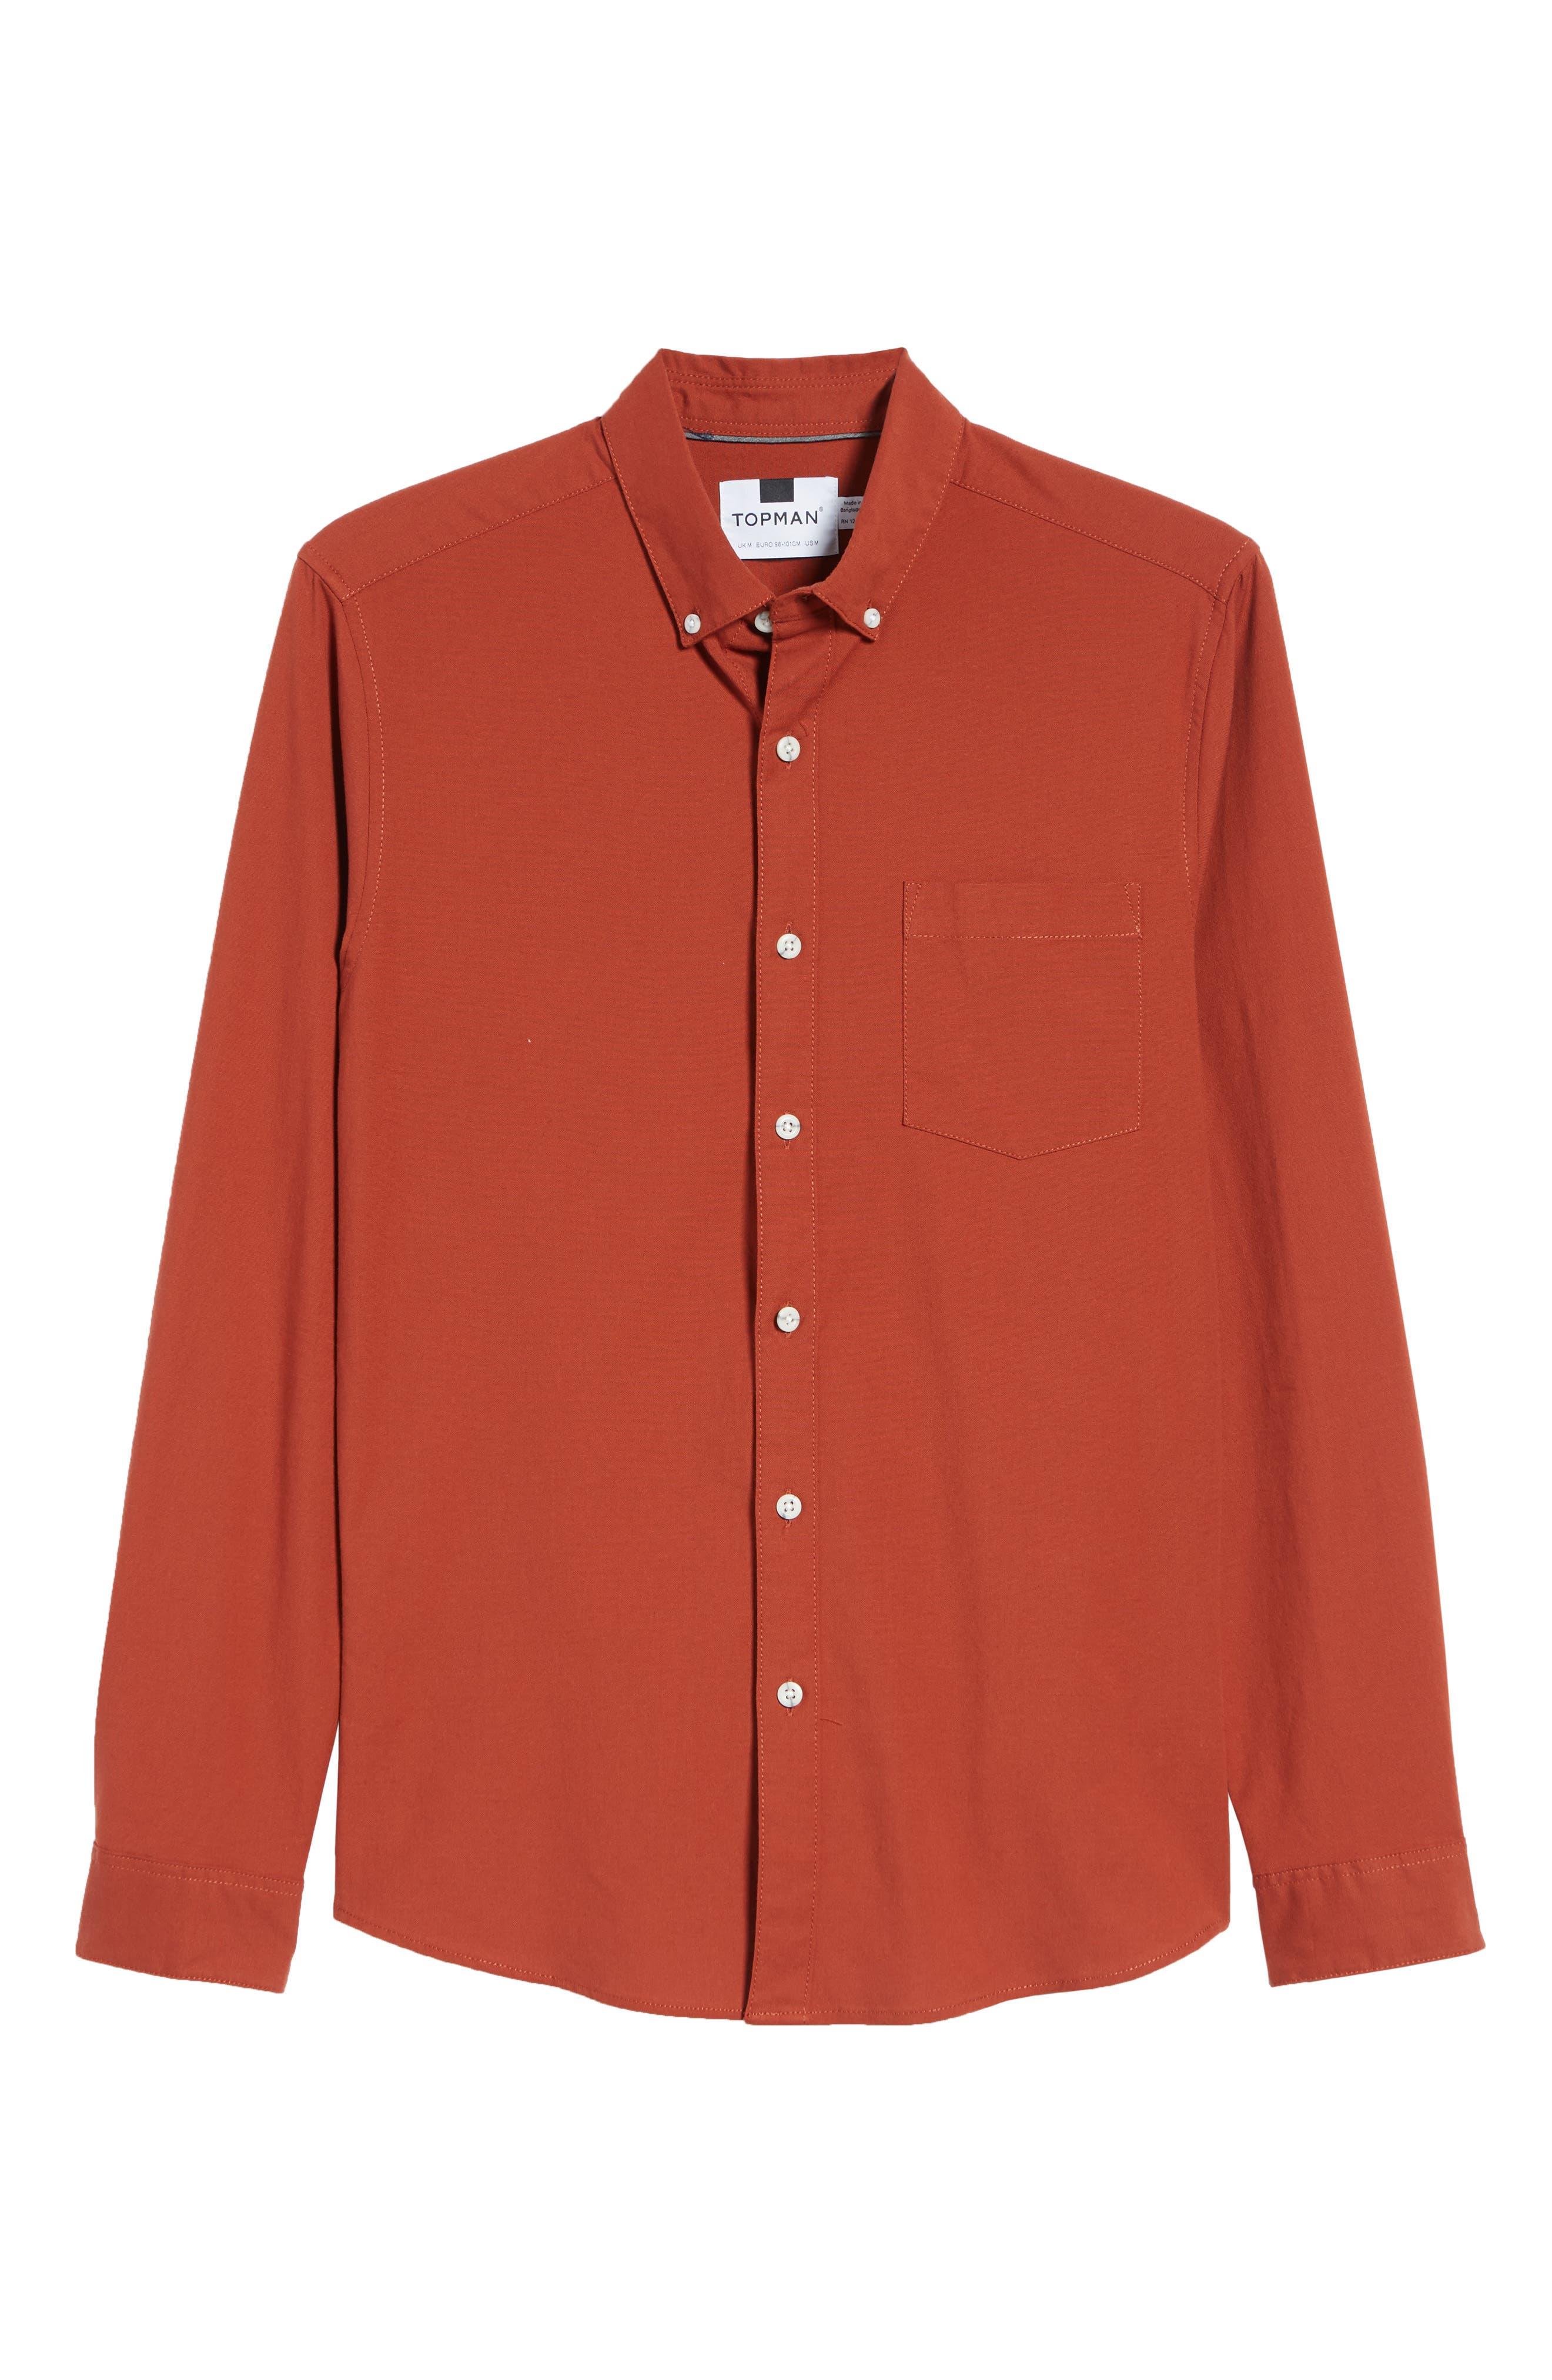 TOPMAN,                             Classic Fit Oxford Shirt,                             Alternate thumbnail 5, color,                             BROWN